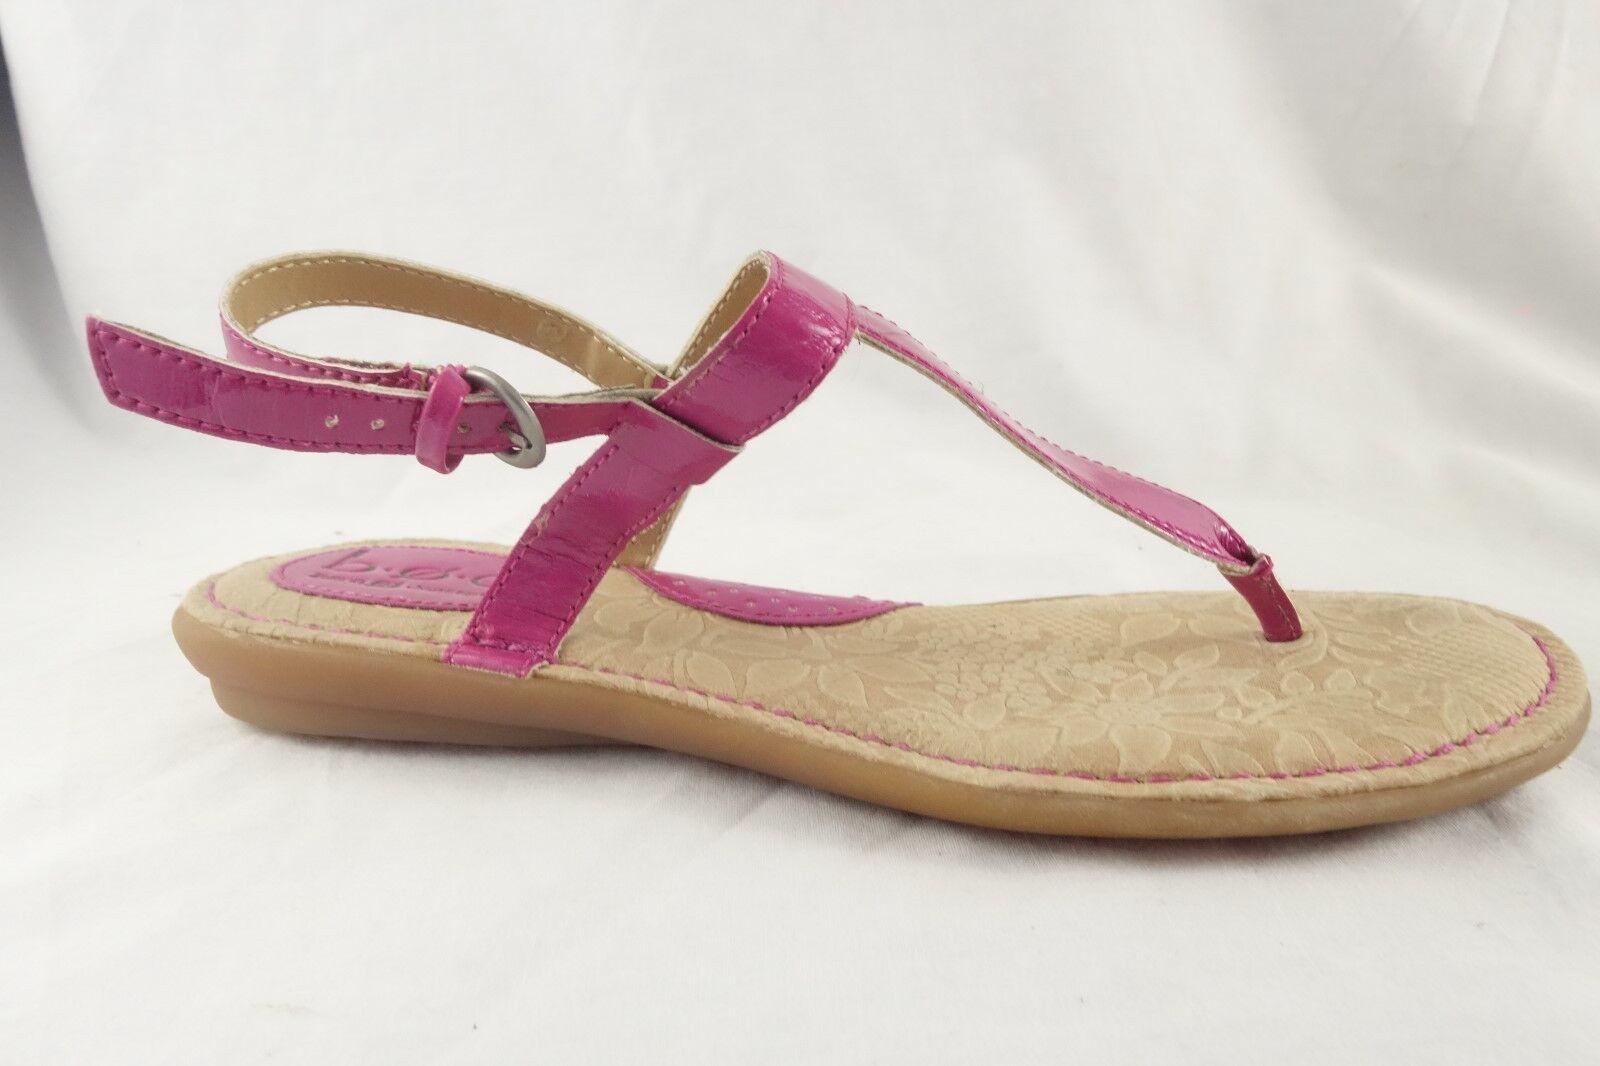 Born B.O.C Pink Thong Flip Flop Sandals Flats shoes Women's 8 39